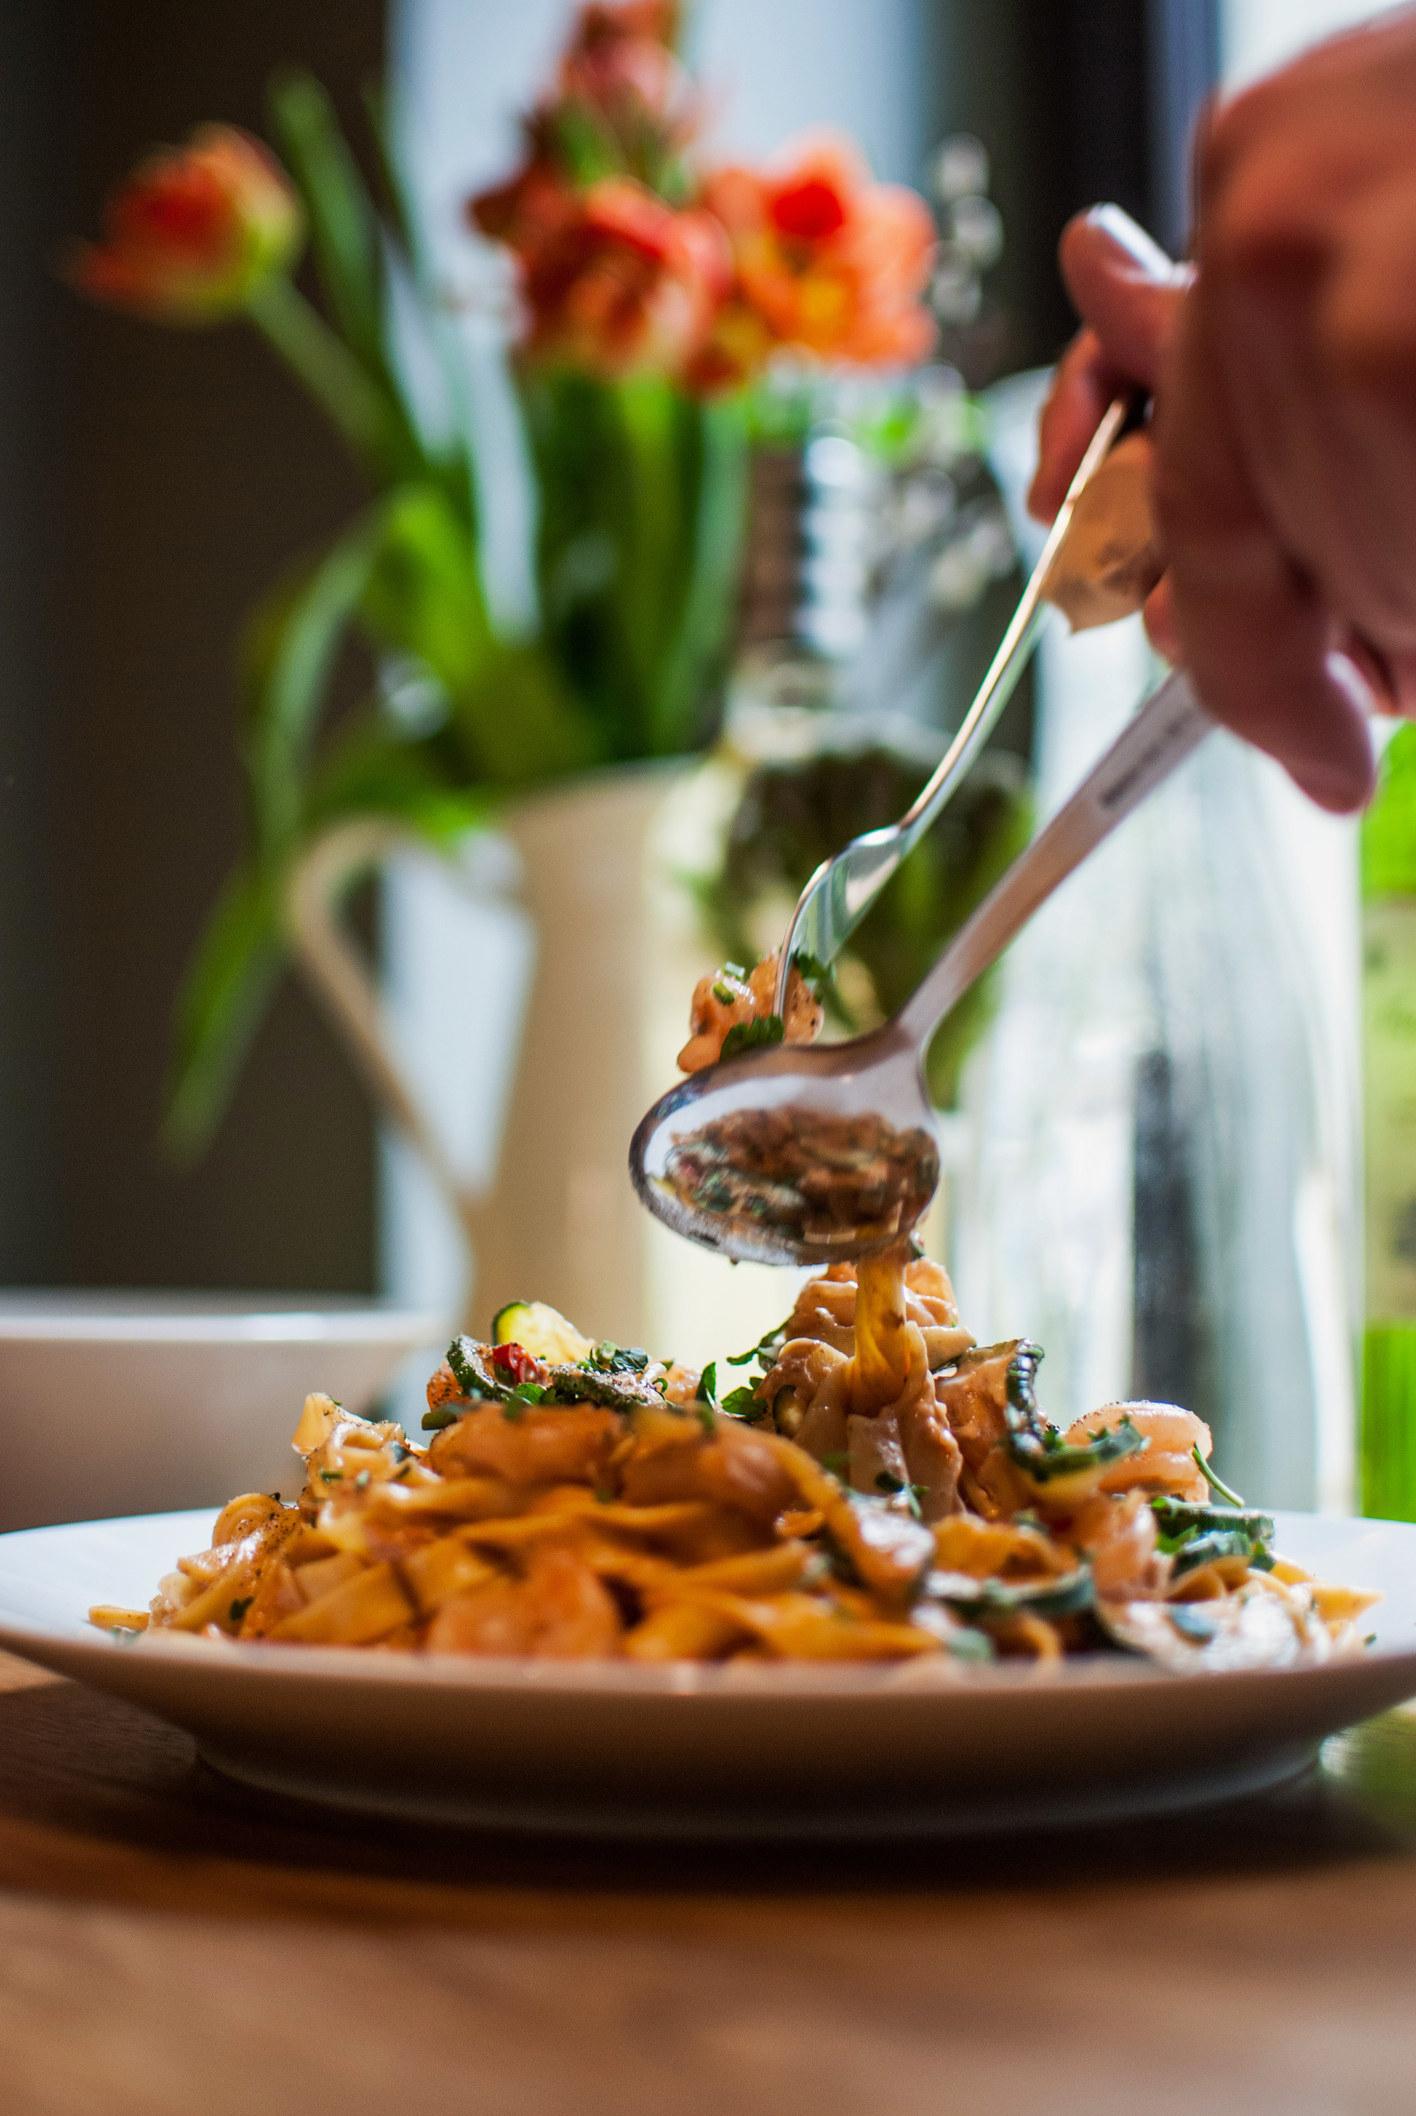 Serving a bowl of tagliatelle.